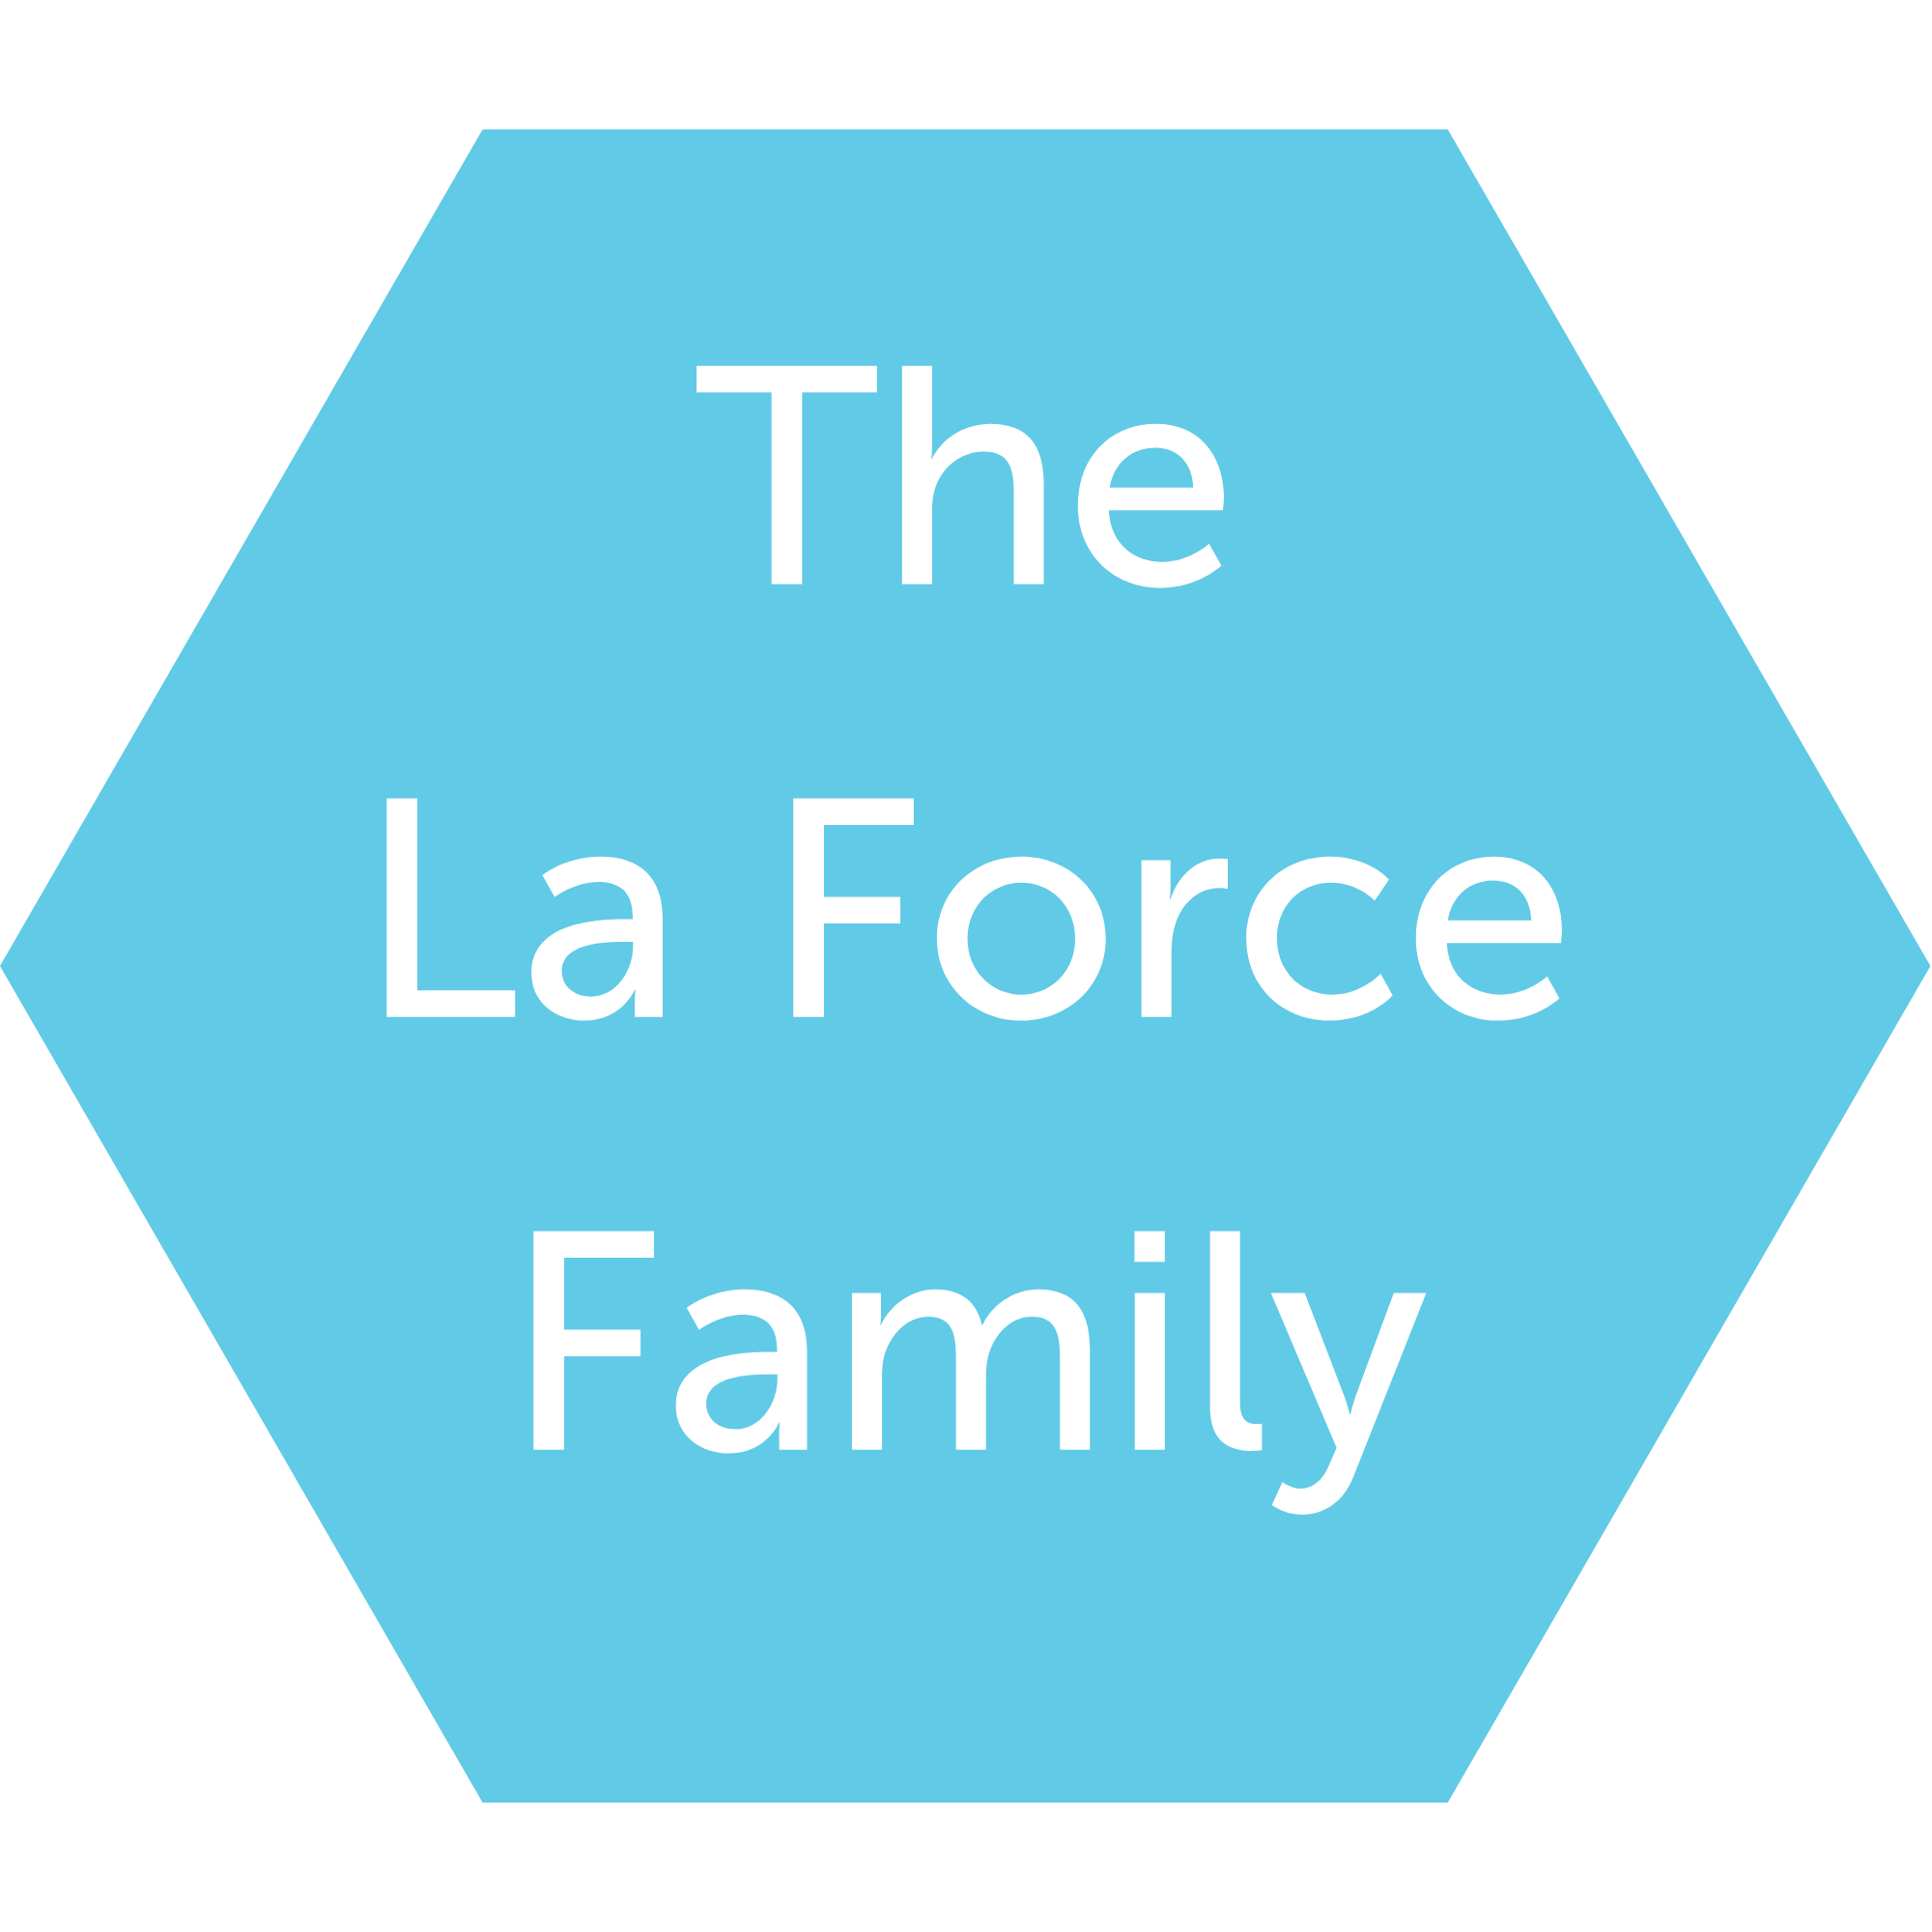 The La Force Family